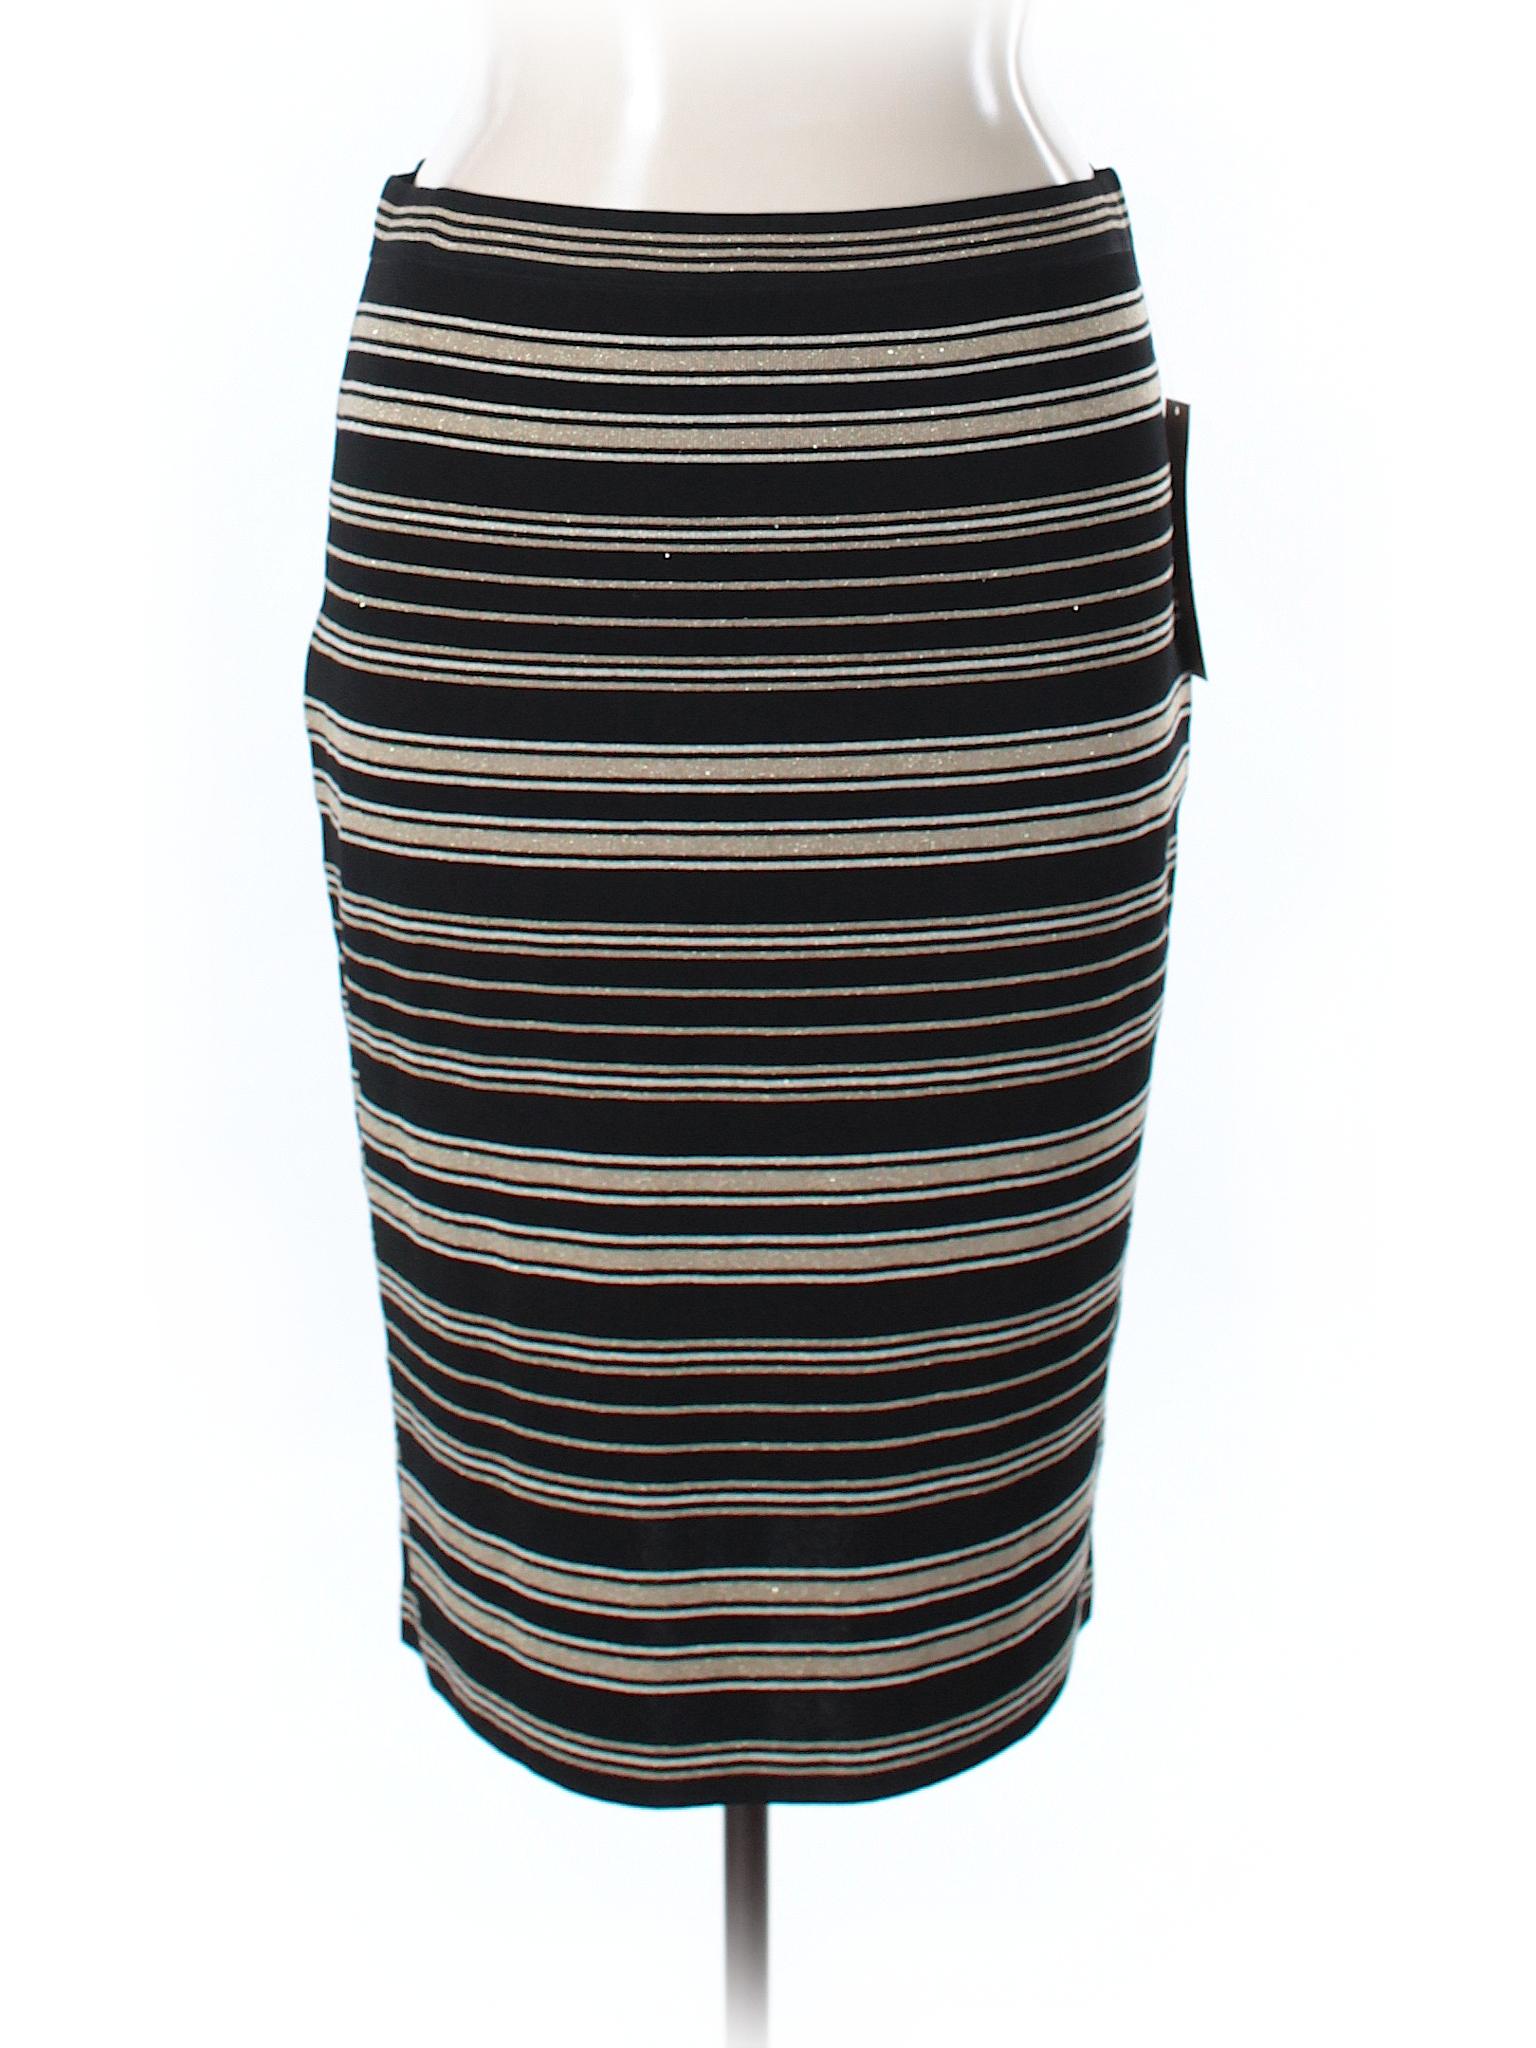 Casual Boutique Skirt Skirt Boutique Skirt Boutique Casual Casual Boutique d5B1Fq